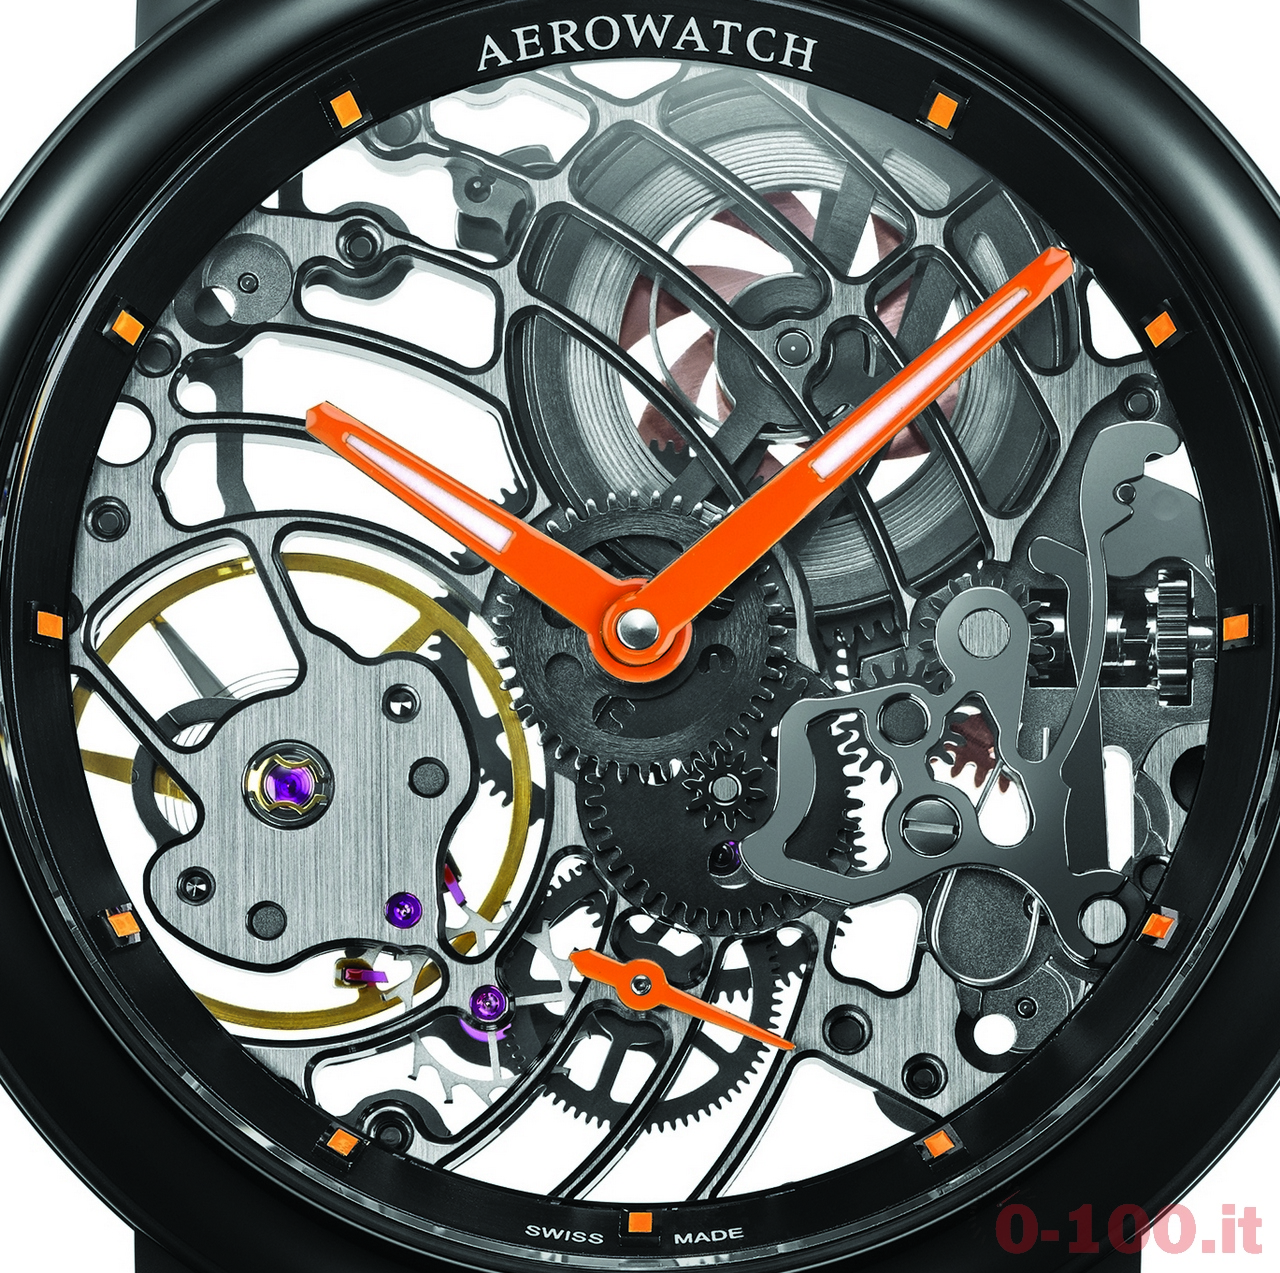 anteprima-baselworld-2015-aerowatch-renaissance-orange-tornado_0-100_3